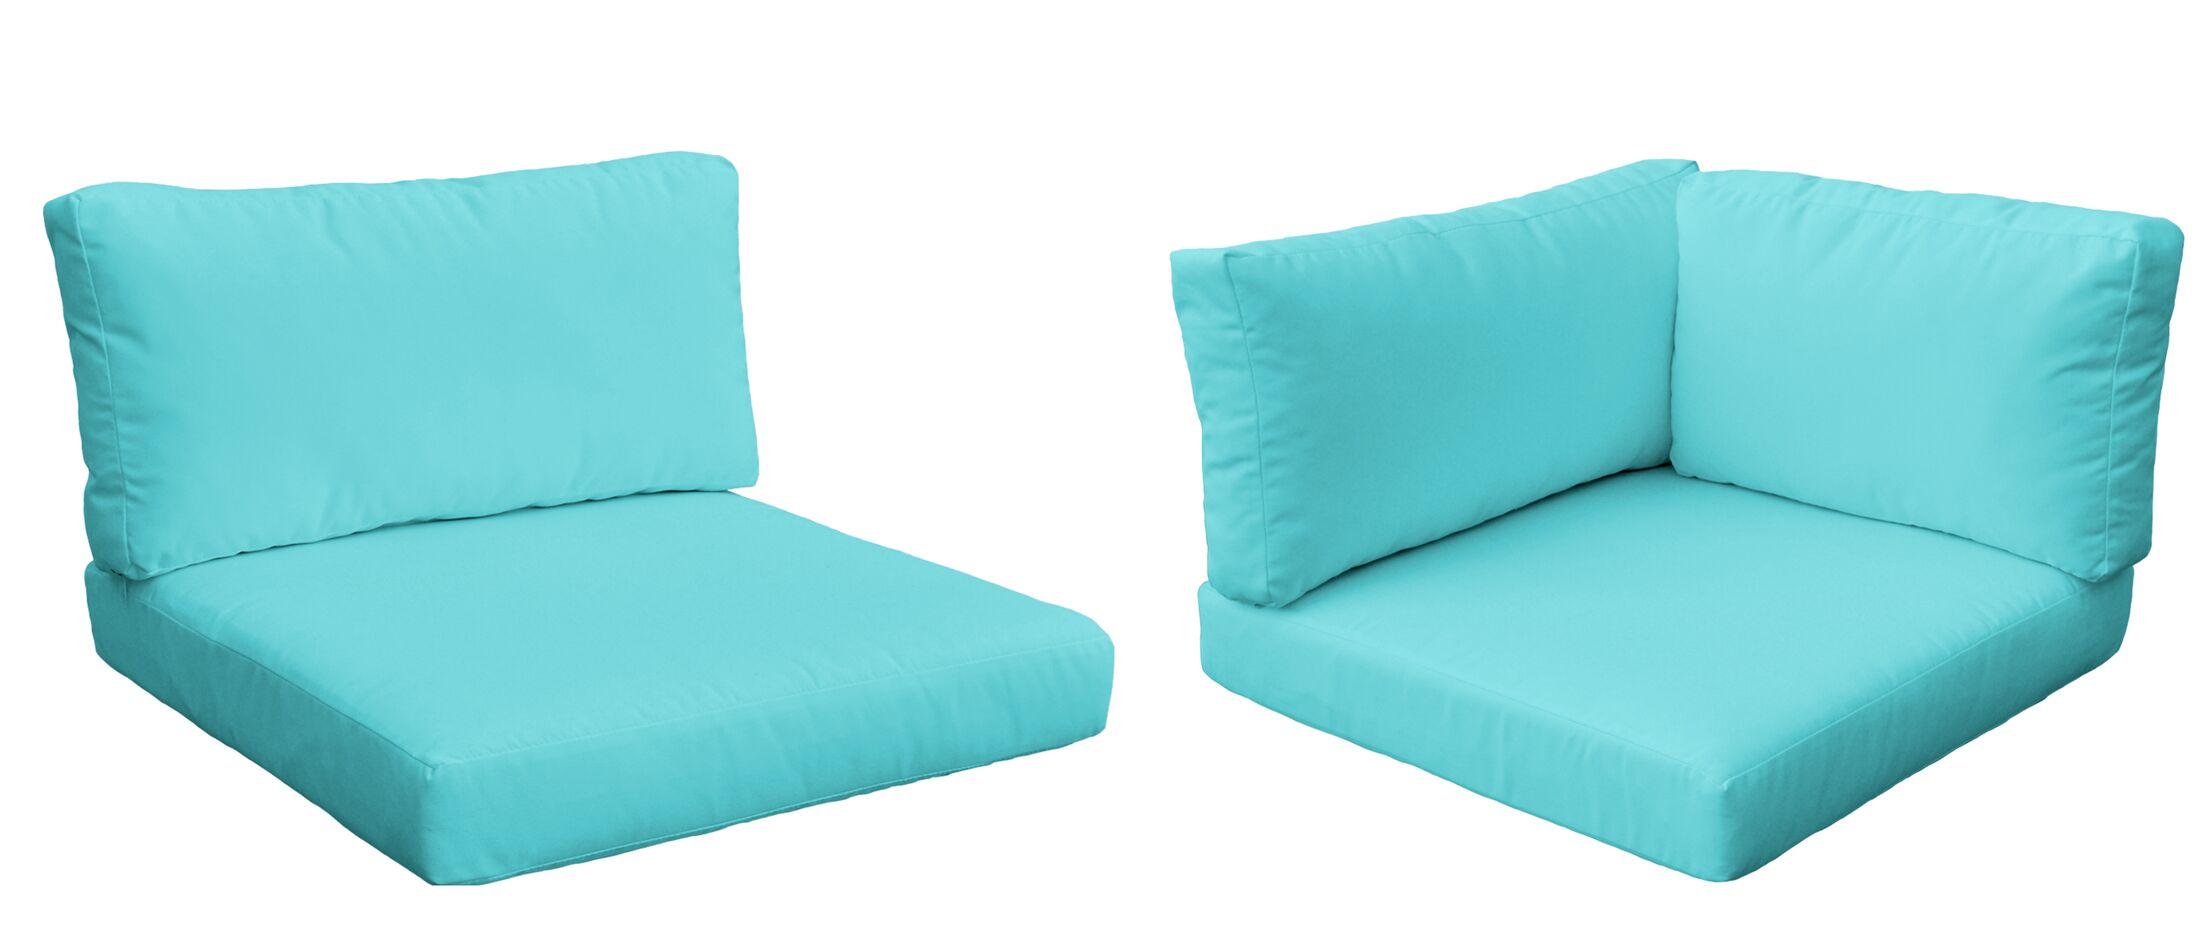 Belle 21 Piece Outdoor Lounge Chair Cushion Set Fabric: Aruba